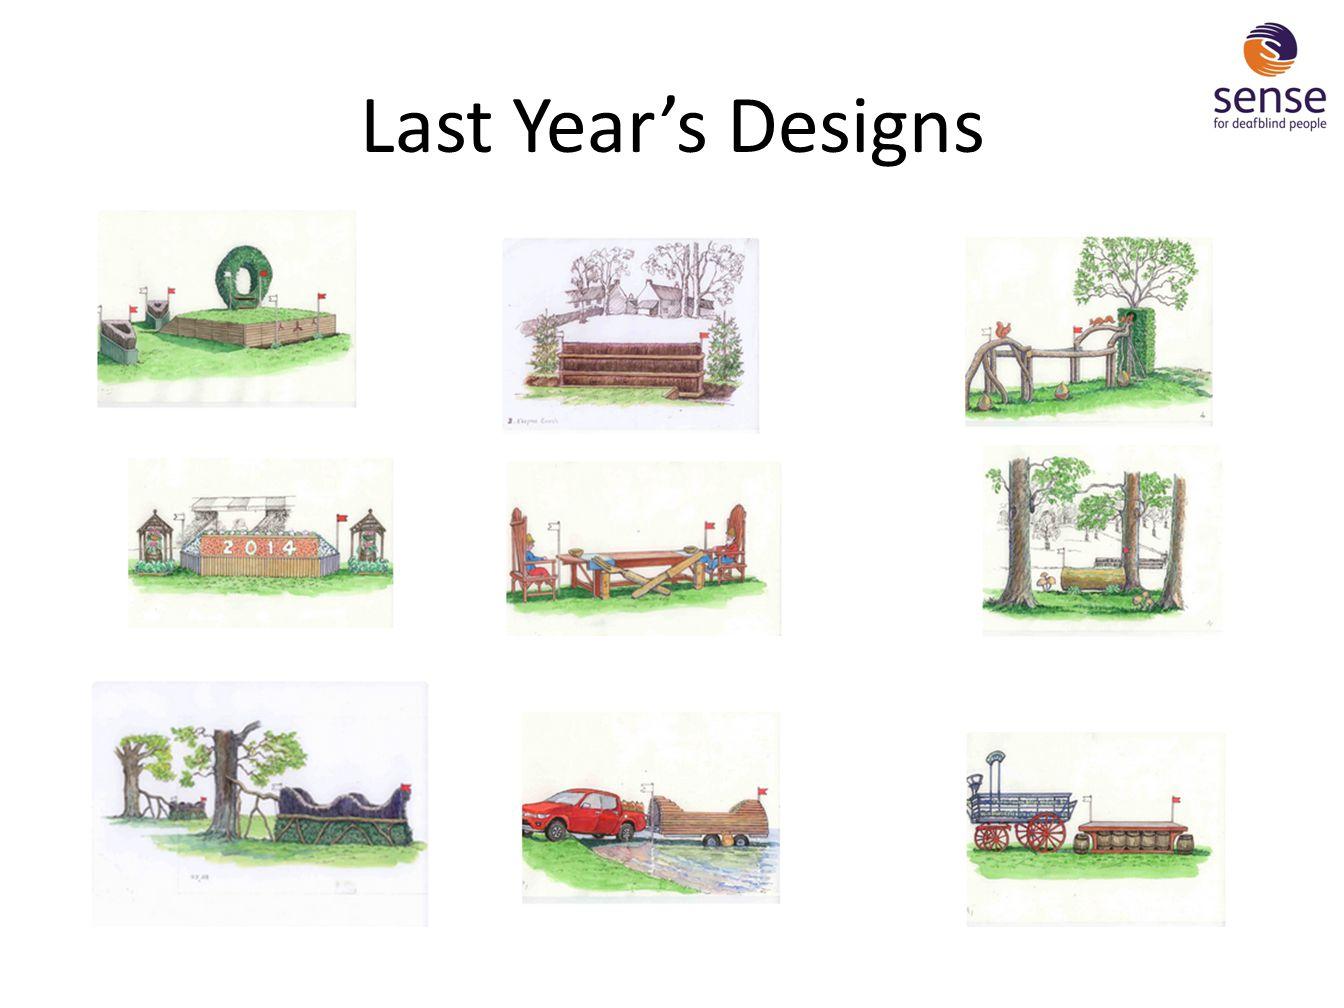 Last Year's Designs